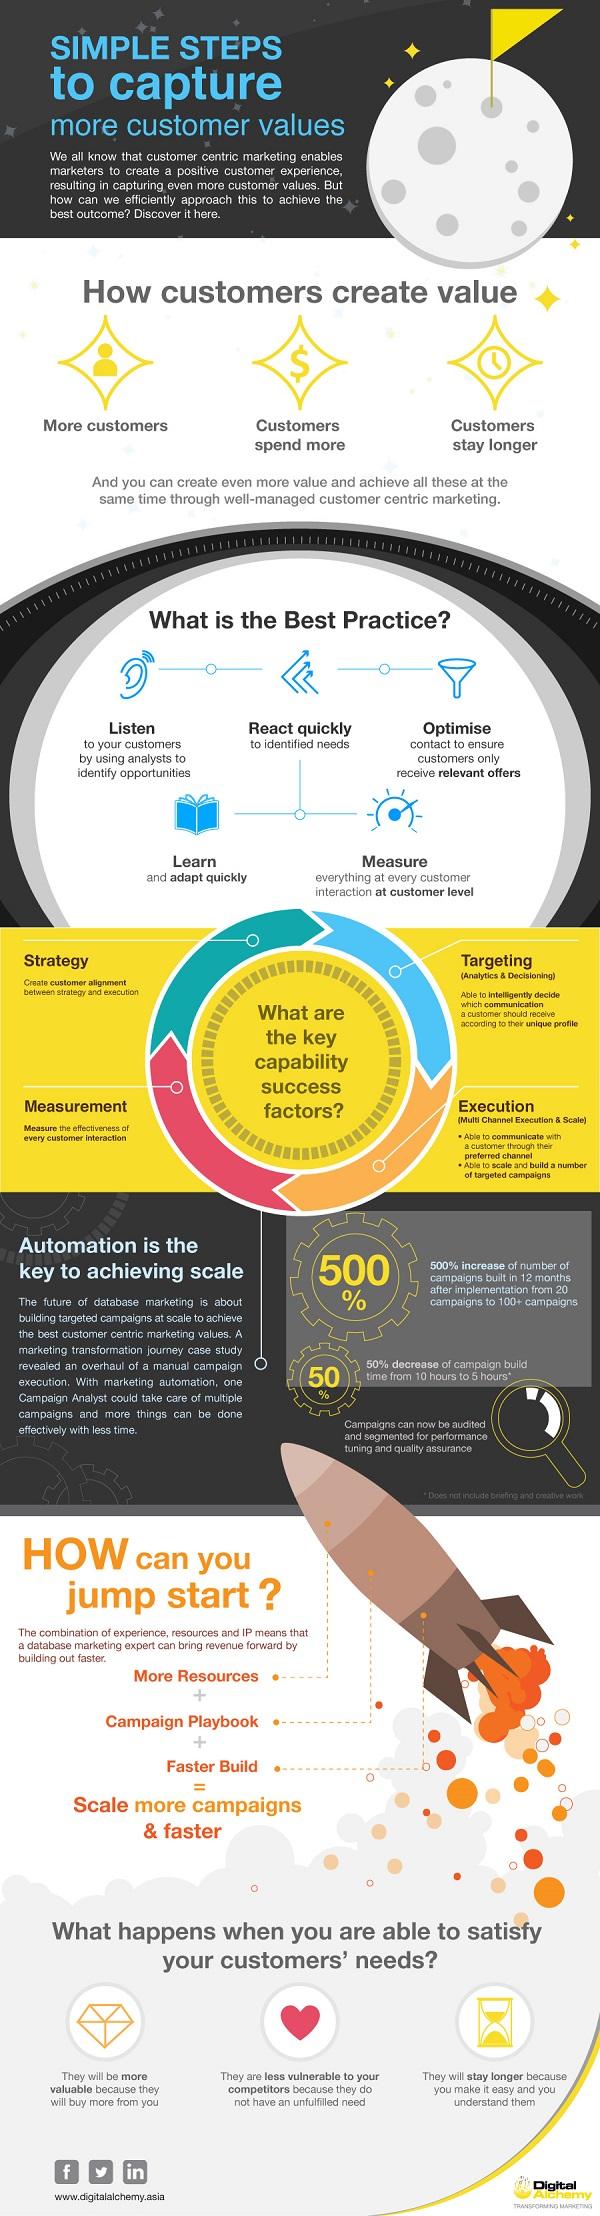 da_infographic_customervalue_v3_noabout